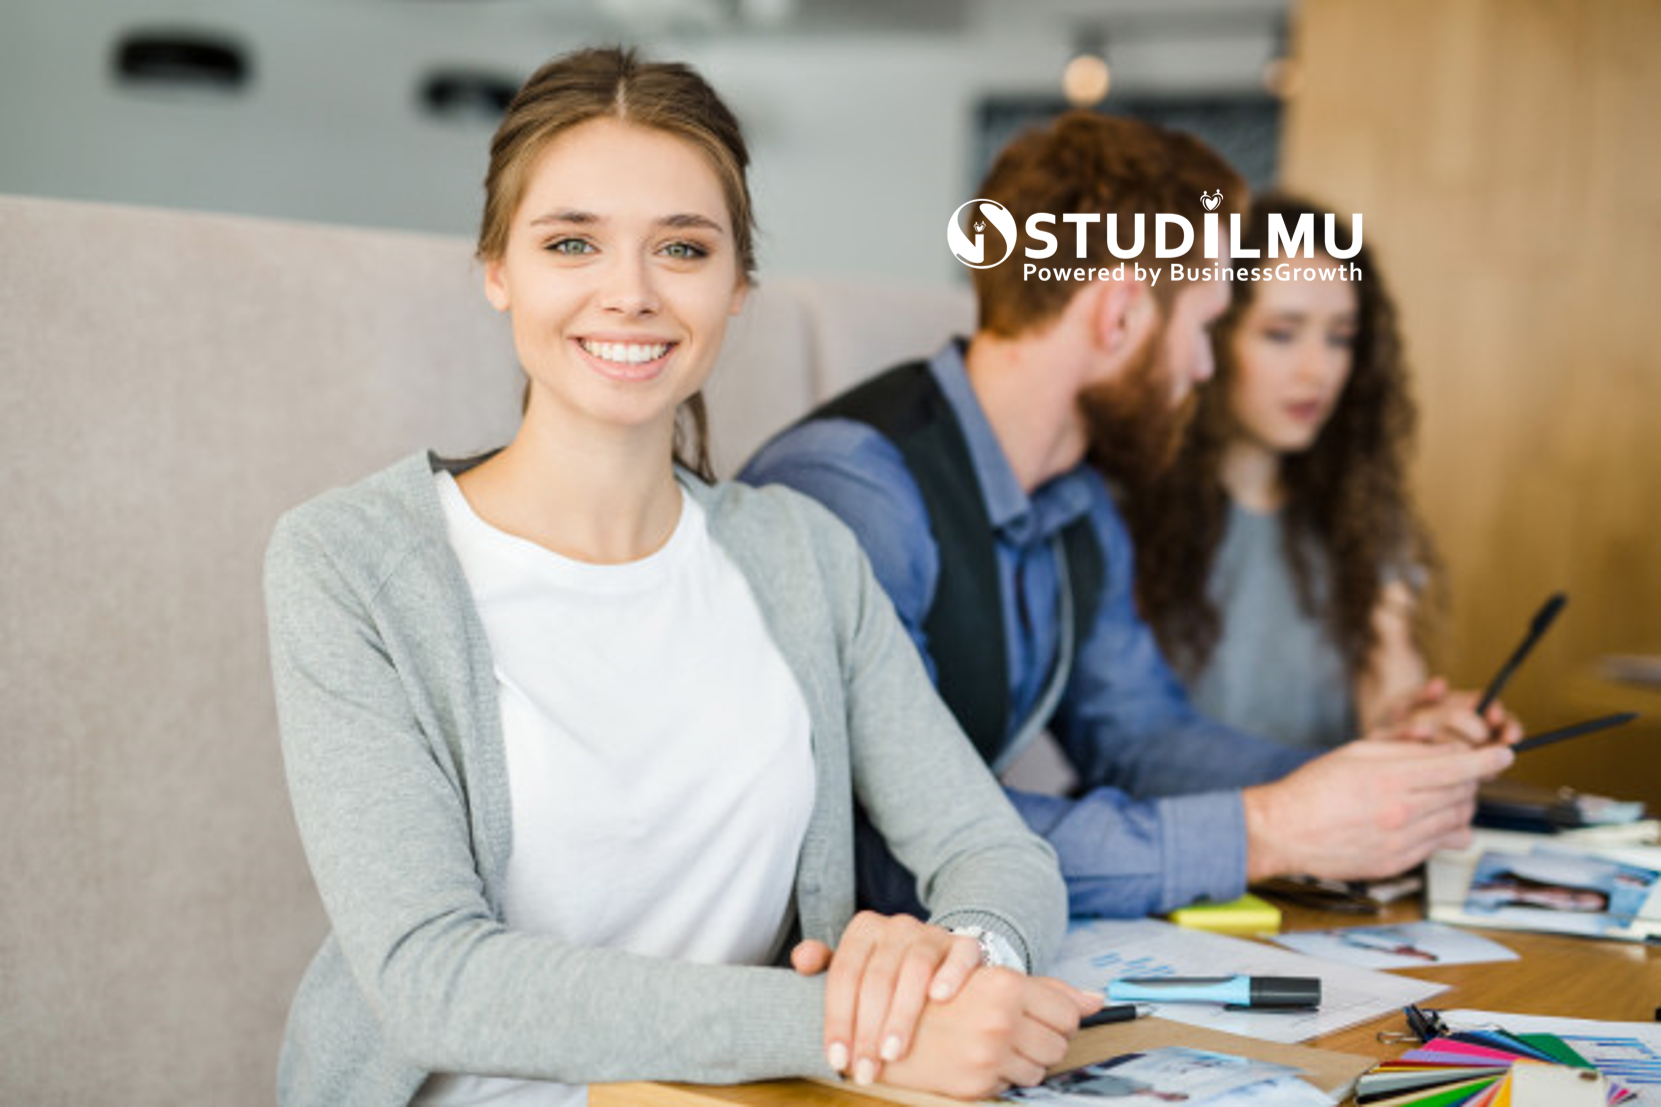 STUDILMU Career Advice - 3 Cara Meraih Kebahagiaan dengan Menerima Diri Sendiri Apa Adanya